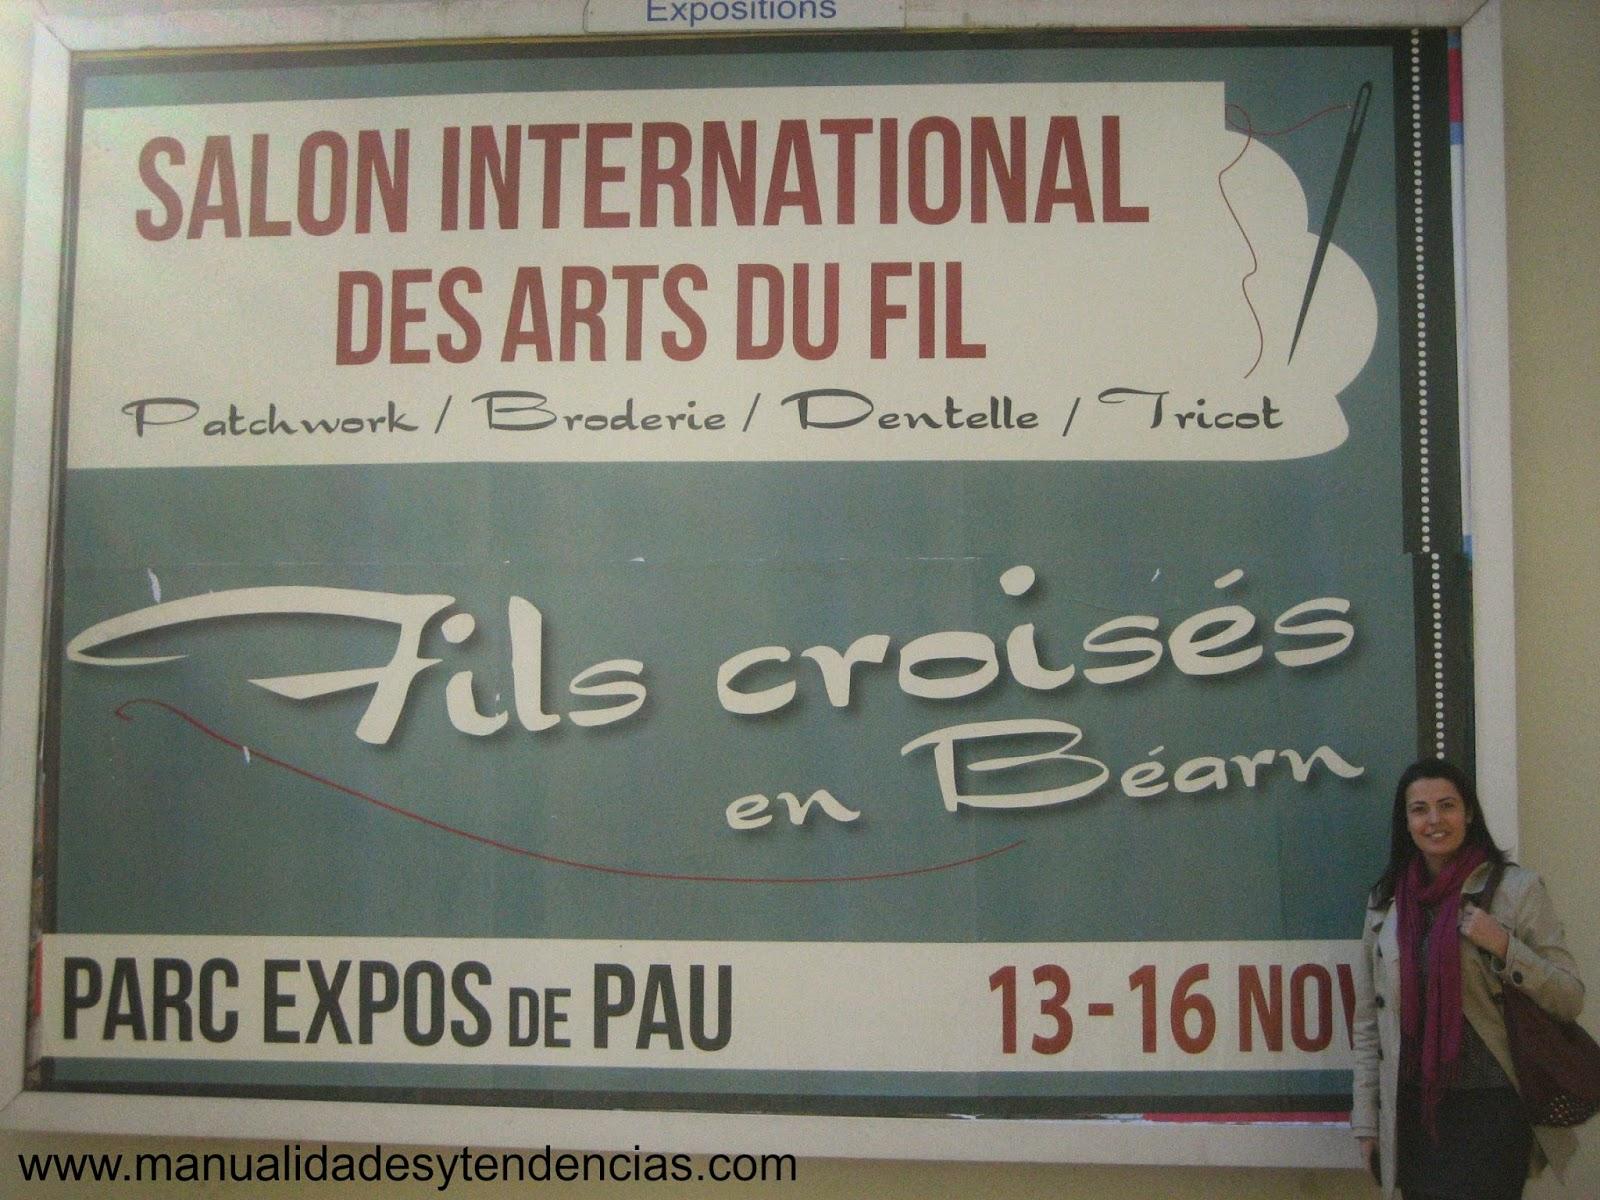 Salon Fils croisés en Béarn 2014